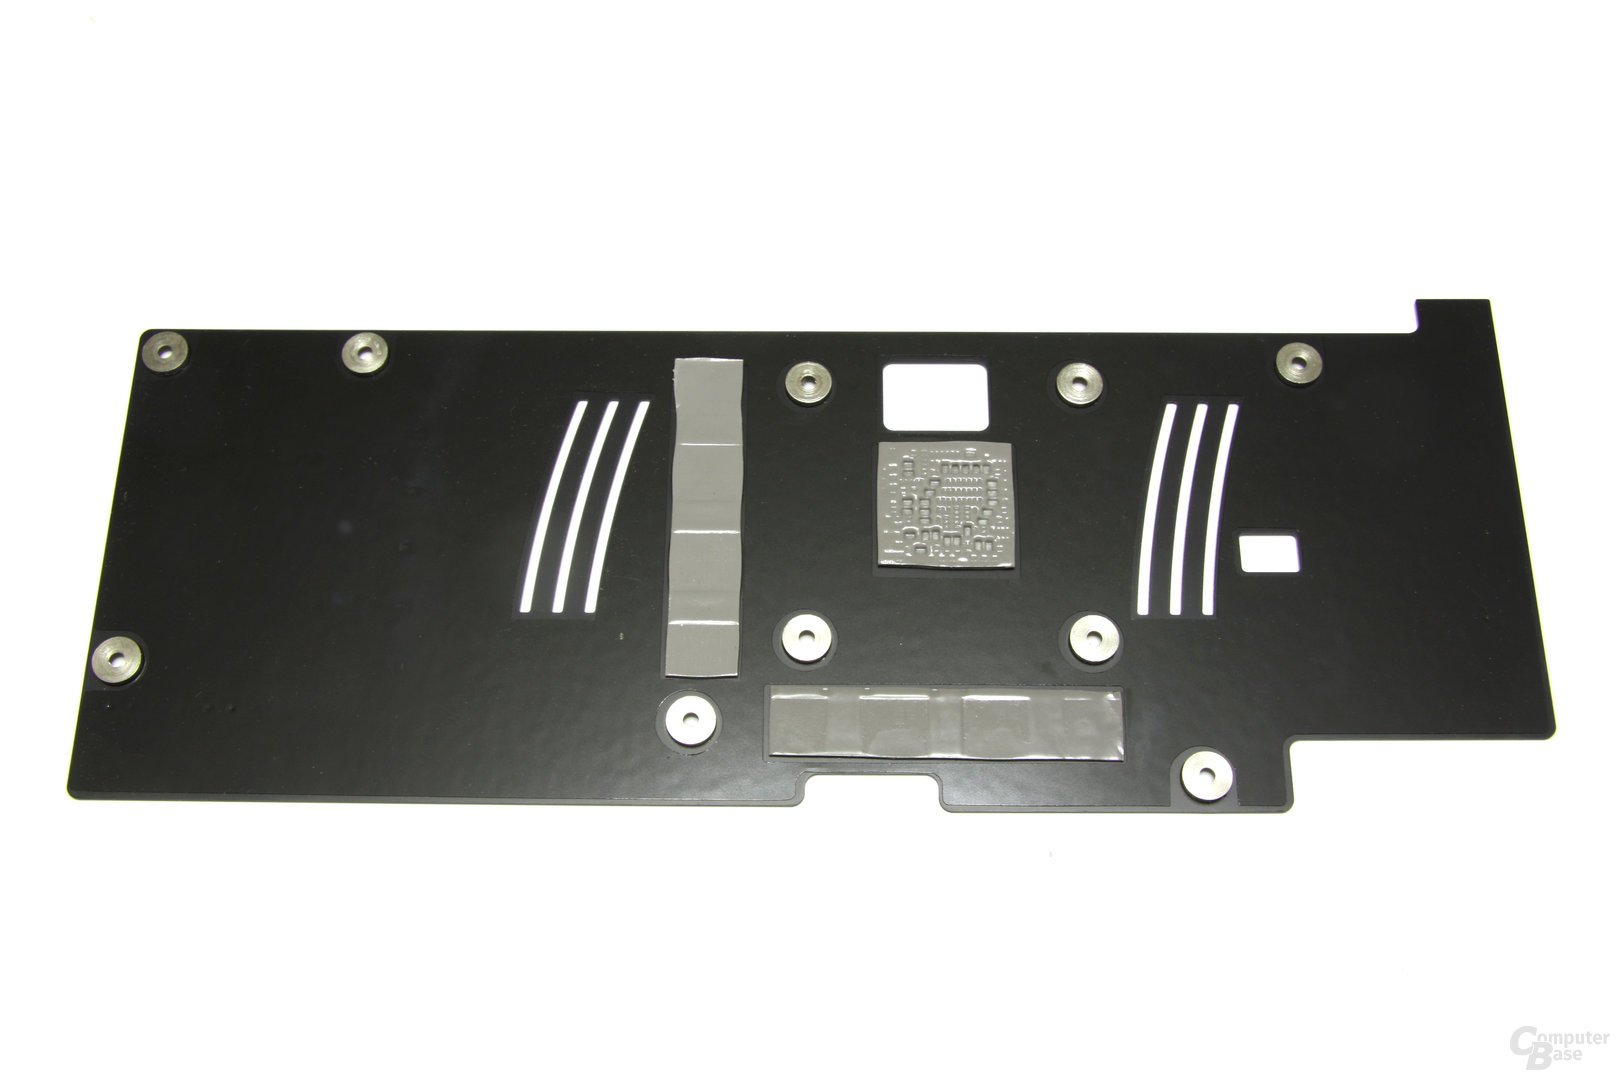 Radeon HD 5870 Matrix Kühlblech